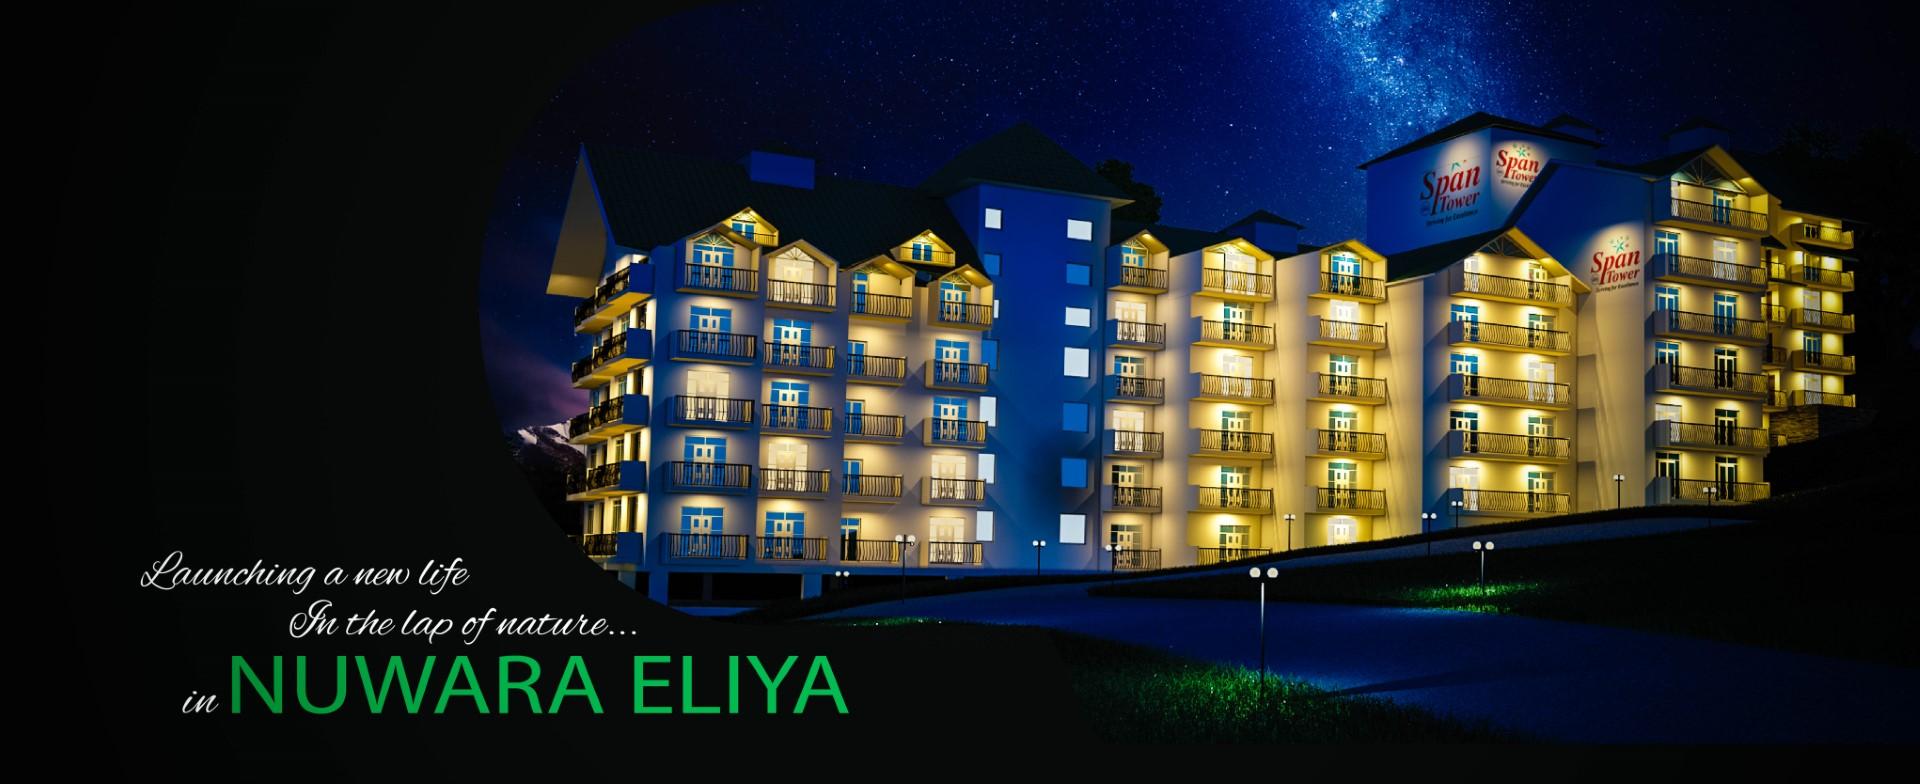 Apartments for Sale Colombo Sri Lanka | Luxury Property